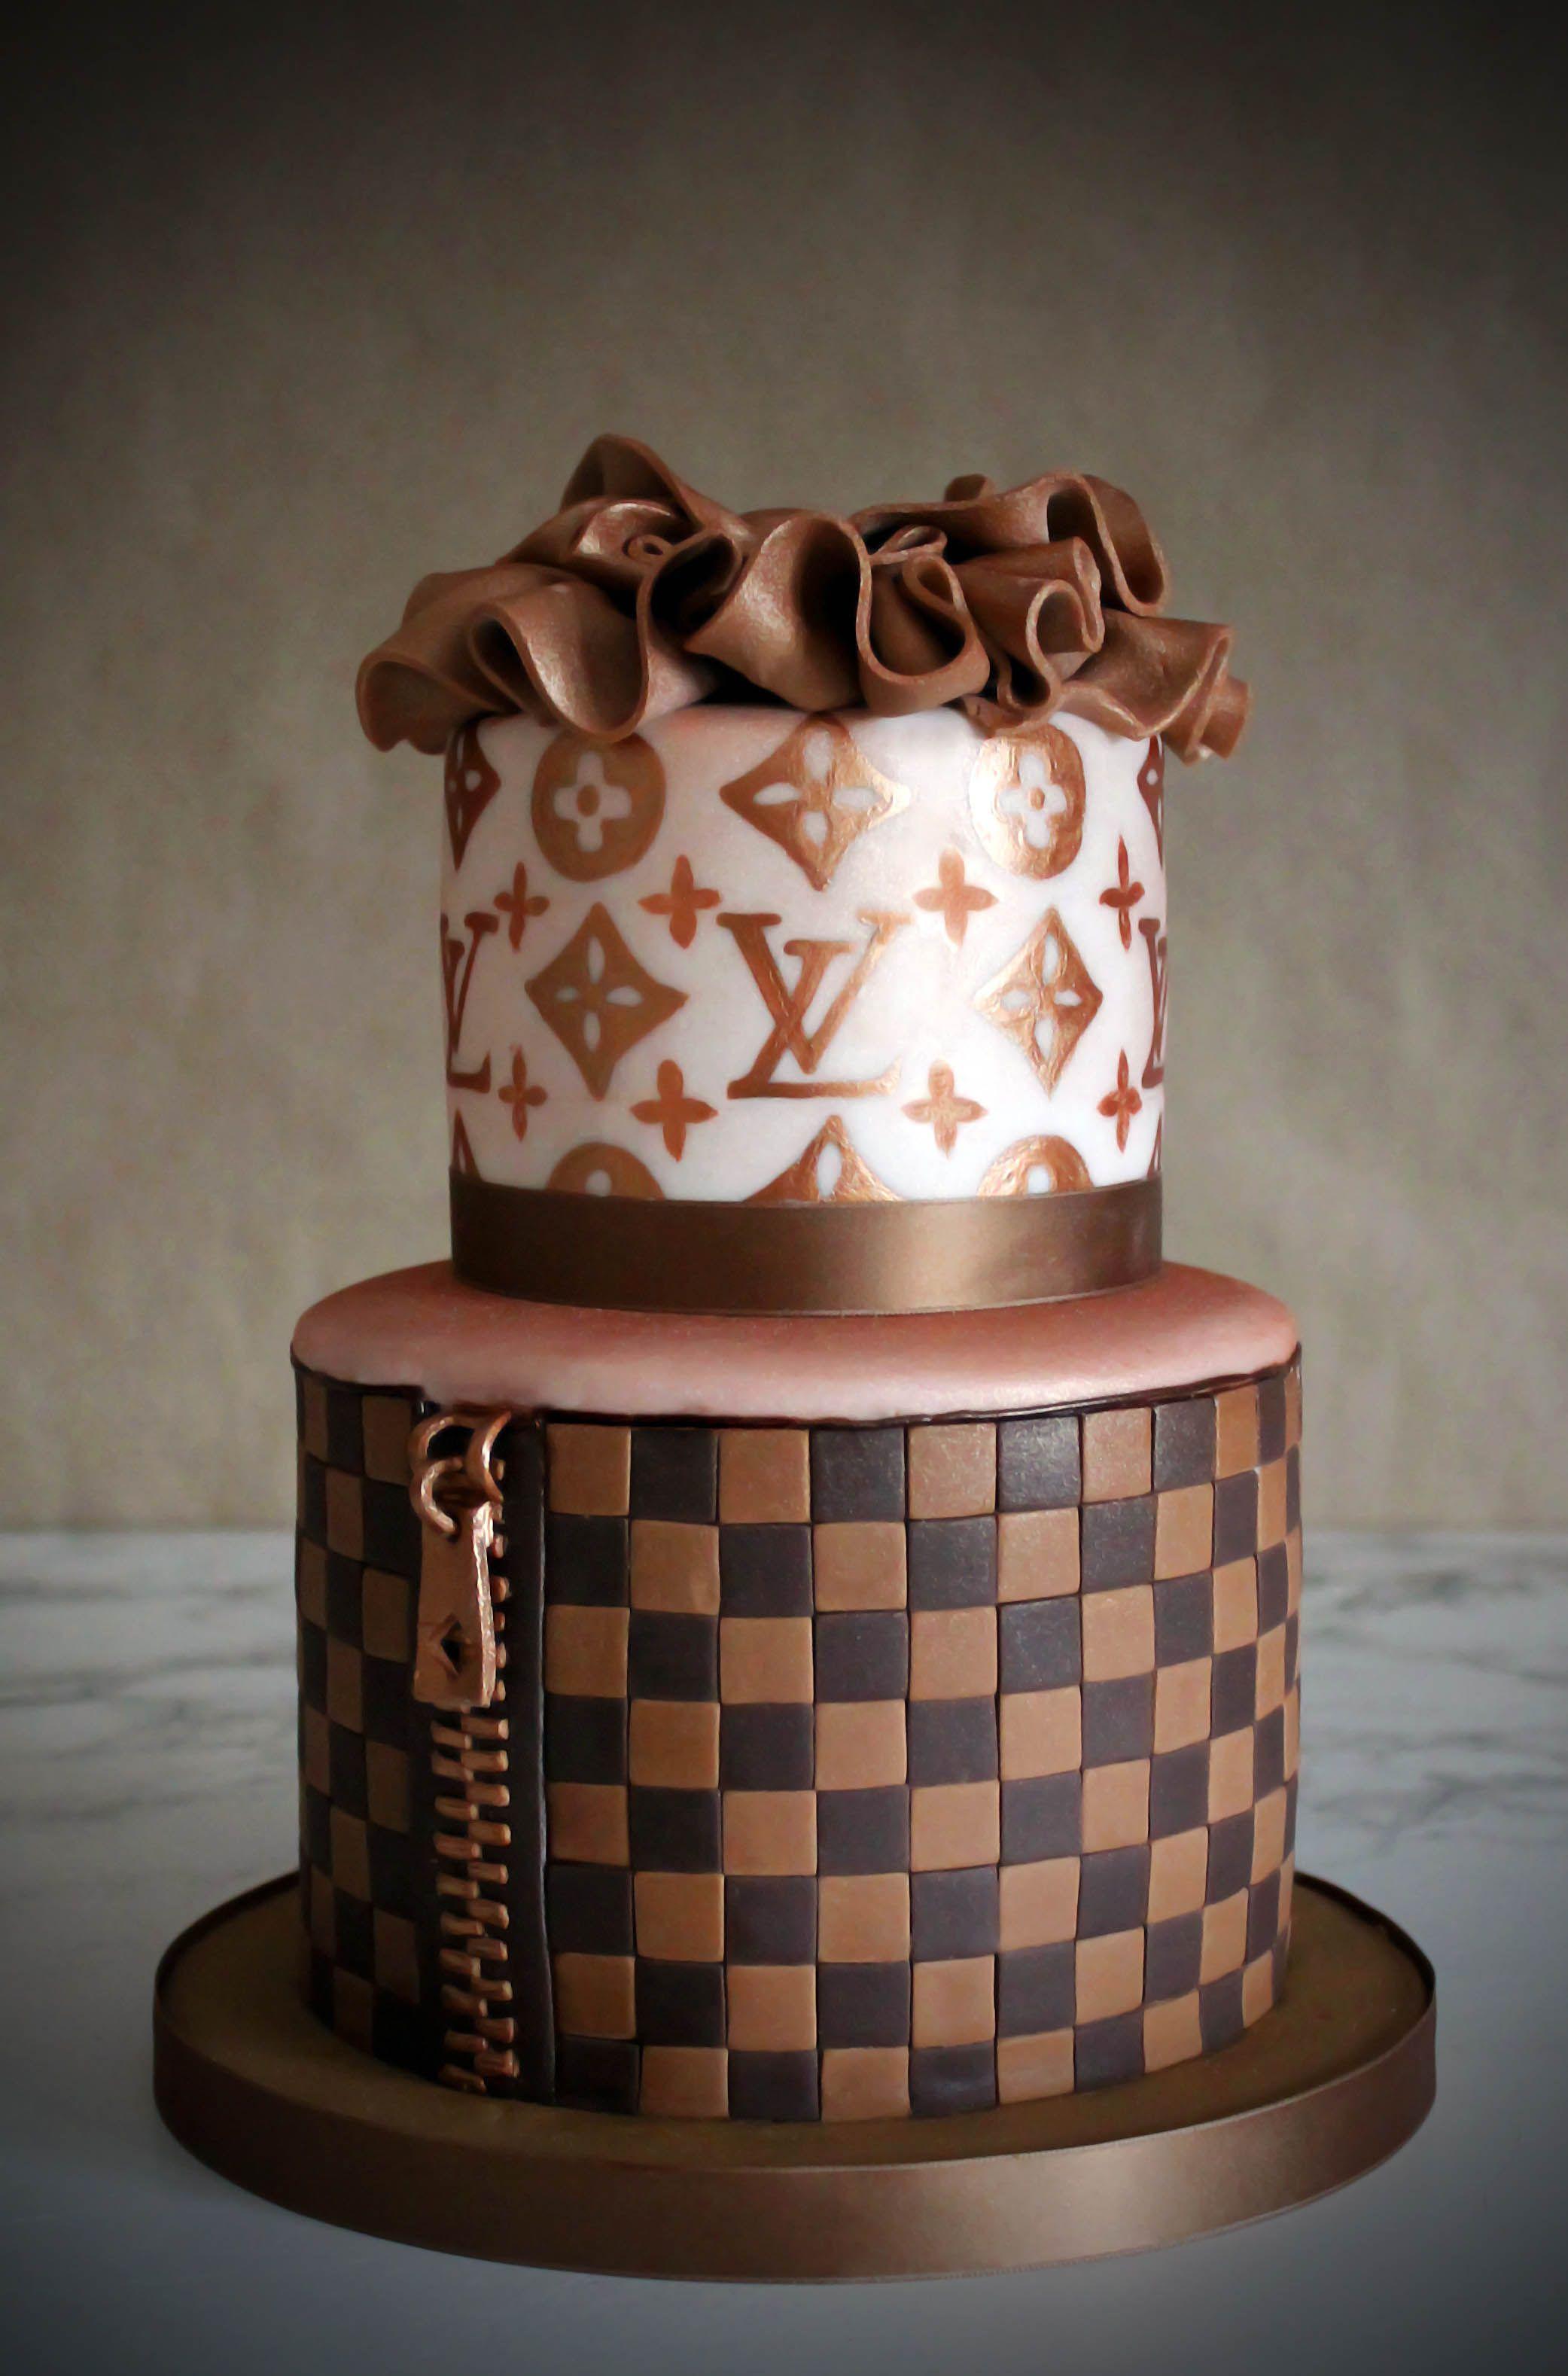 Louis Vuitton Cake Sweetlittlebitesfo Party Time